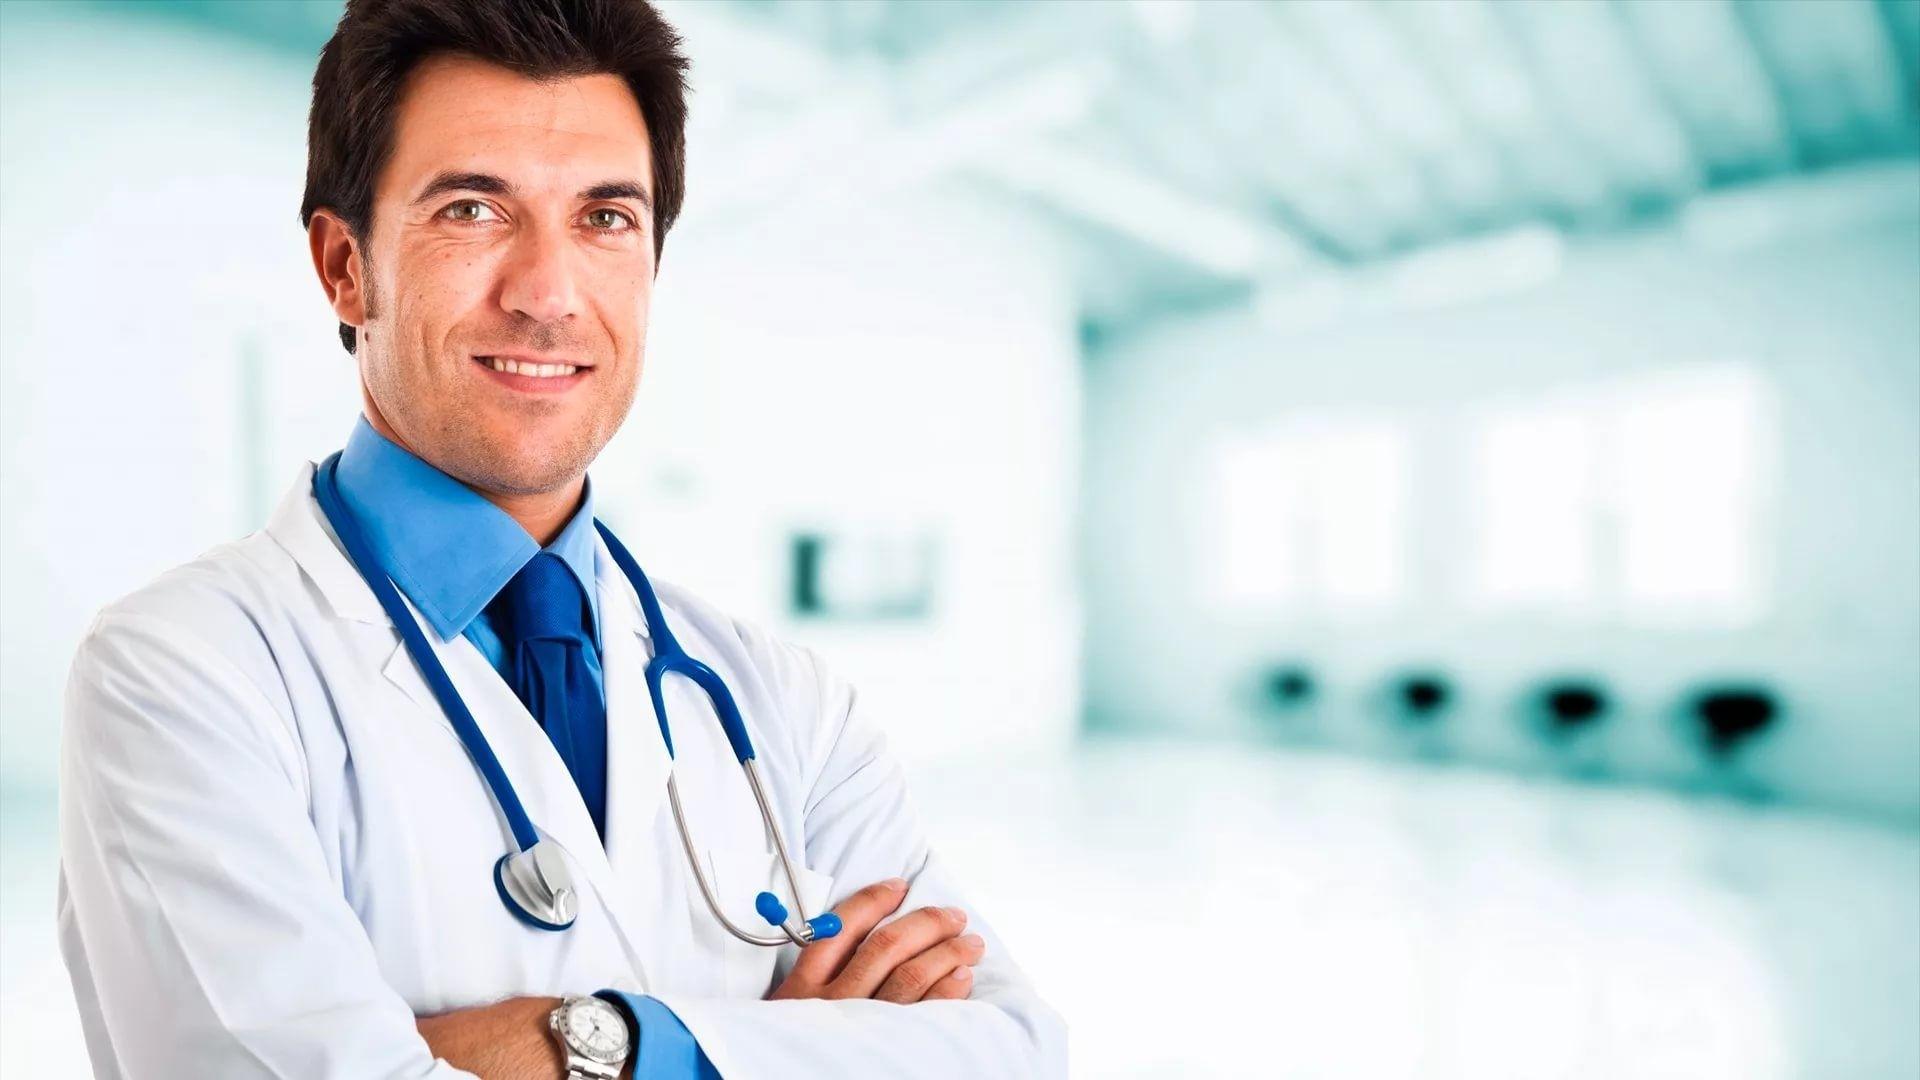 Medical wallpaper photo hd